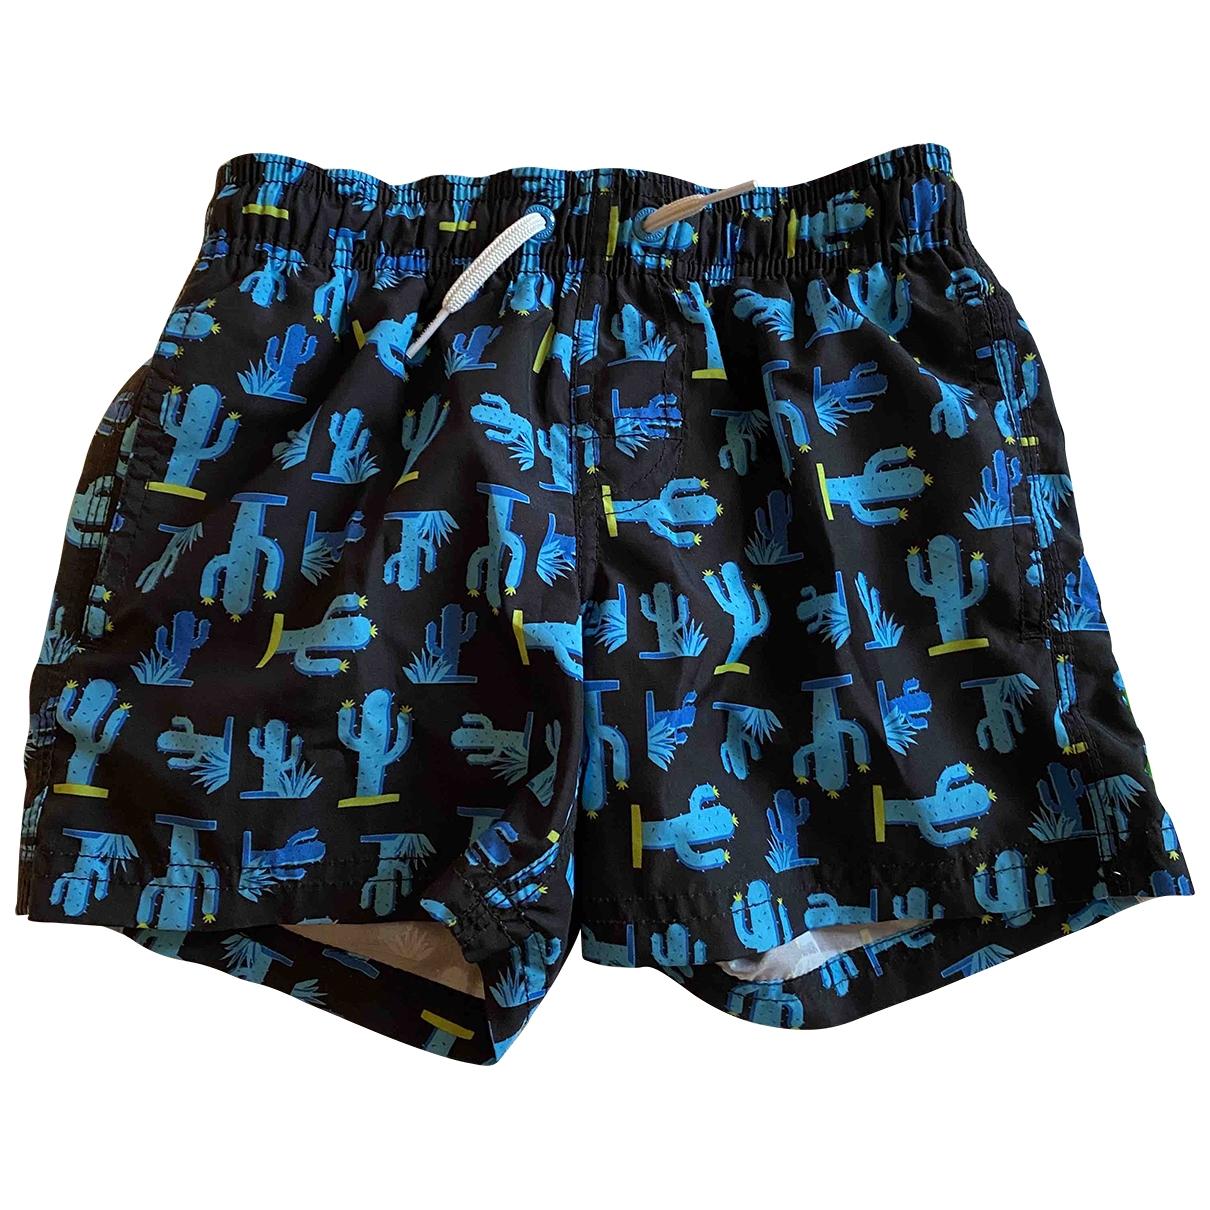 Sundek \N Shorts for Kids 6 years - until 45 inches UK